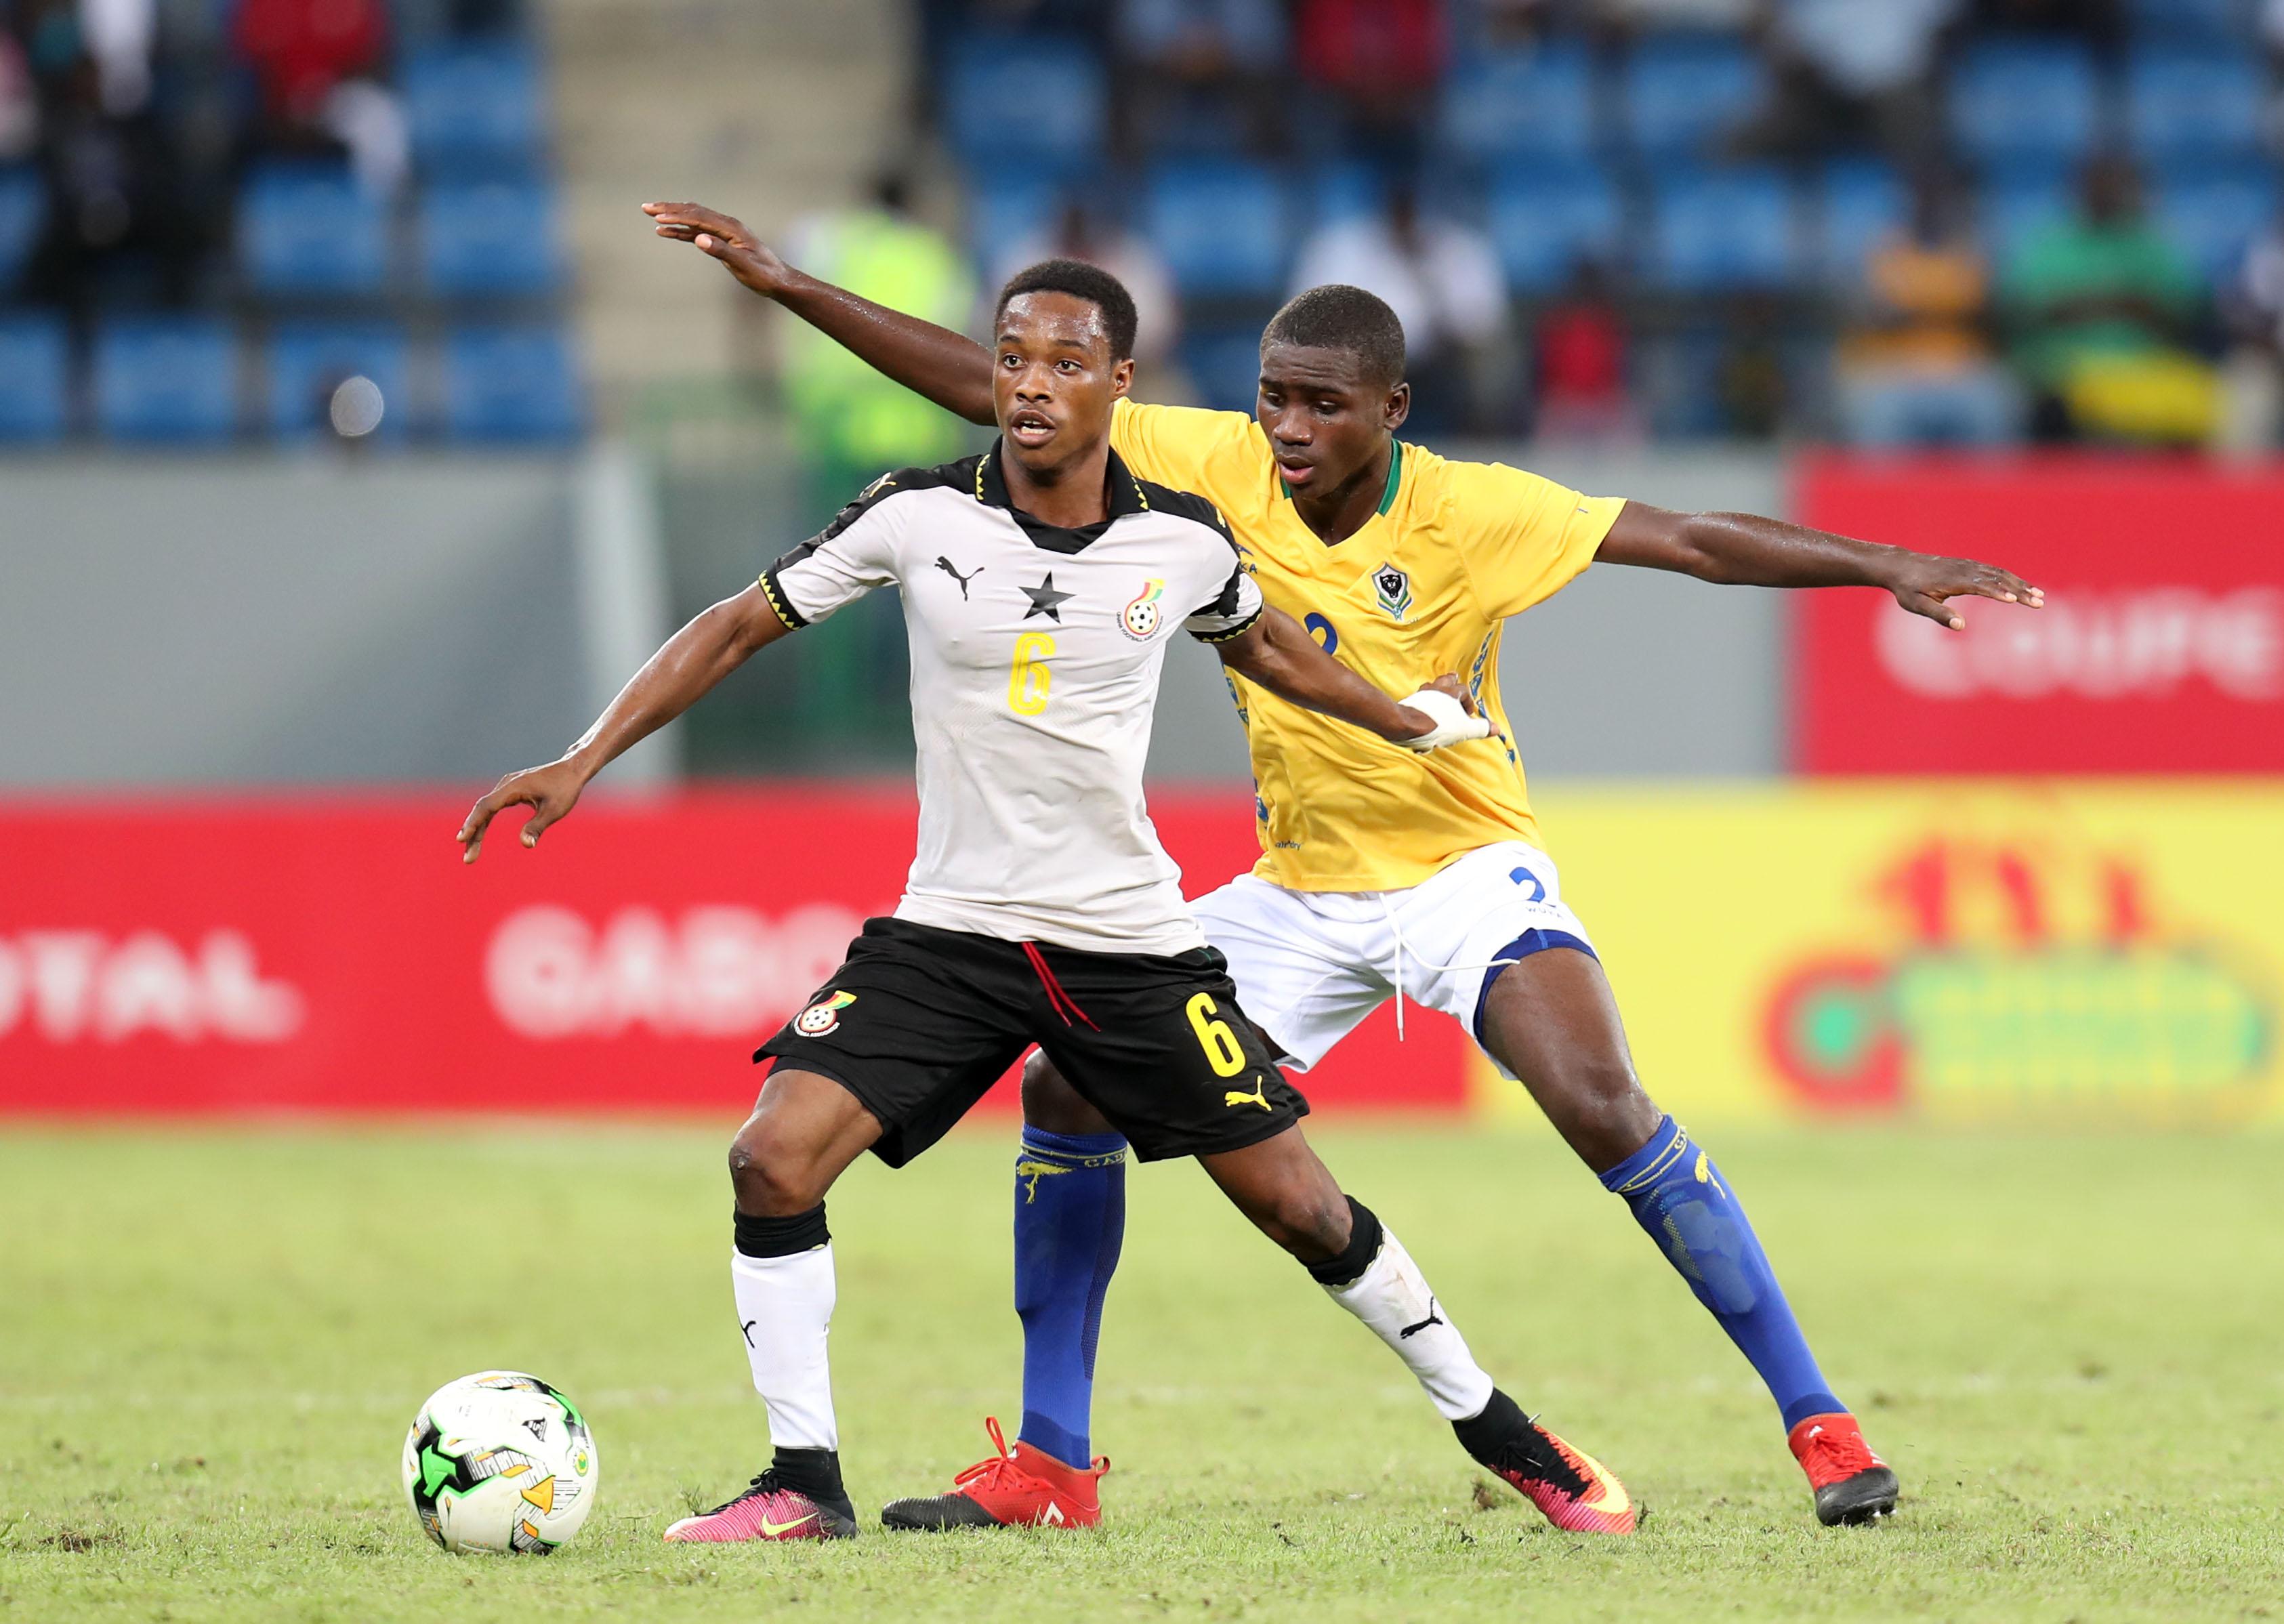 Eric Ayiah, Ghana U17